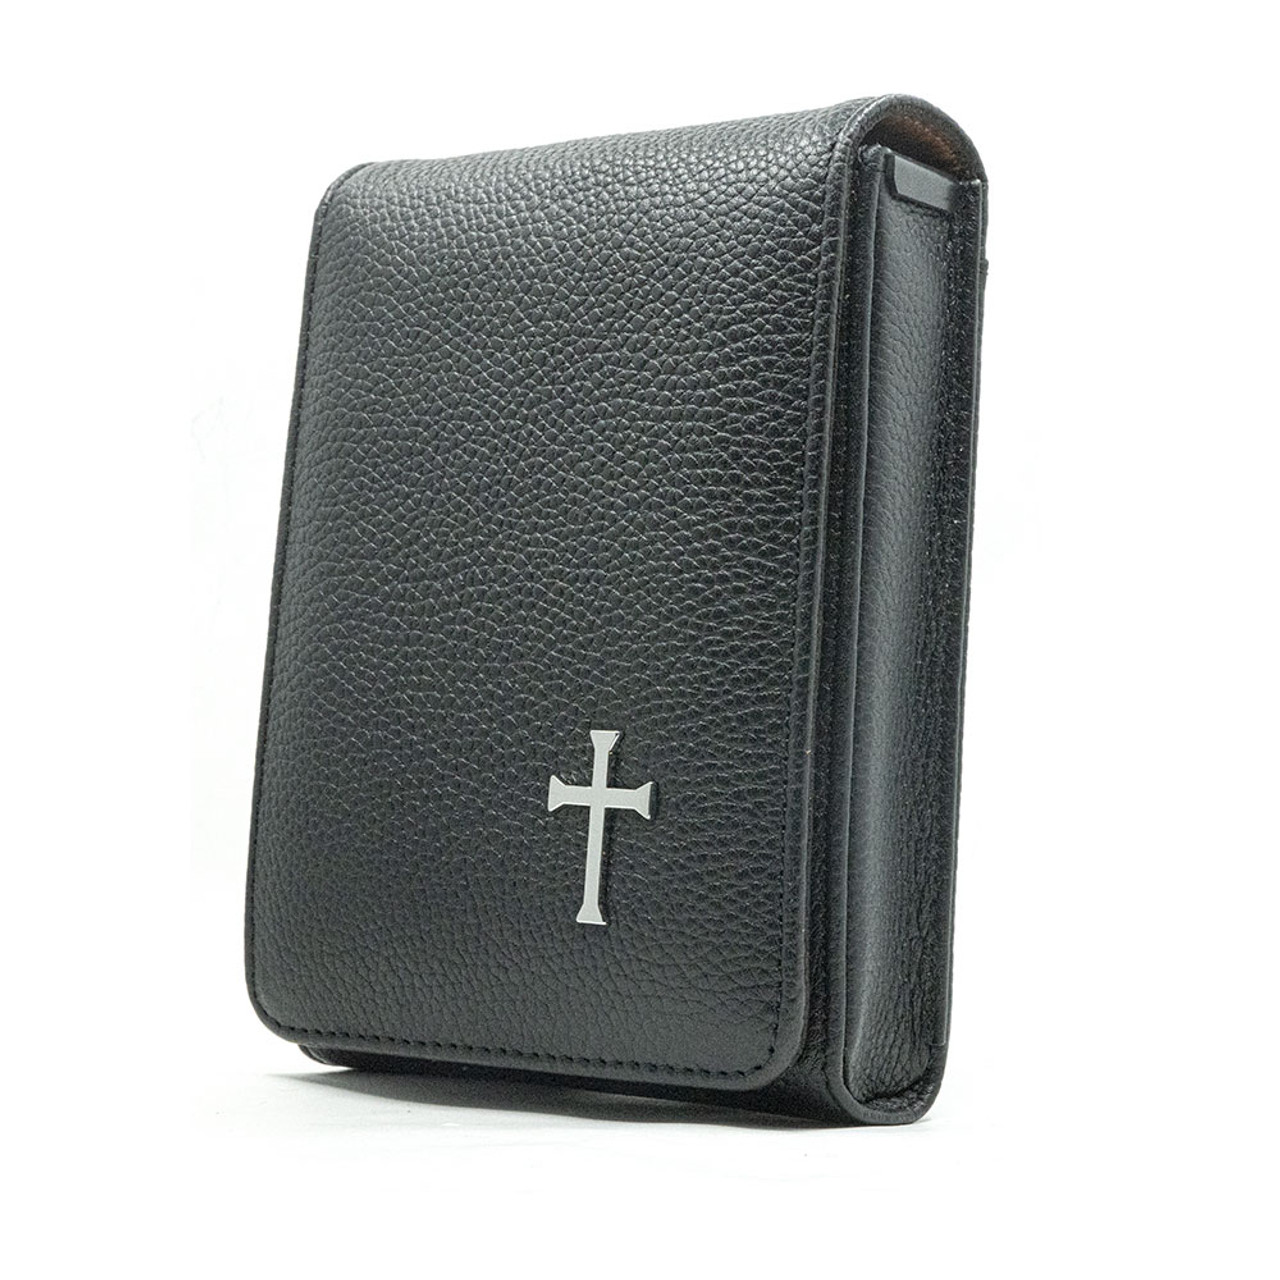 Kahr CW45 Black Leather Cross Series Holster